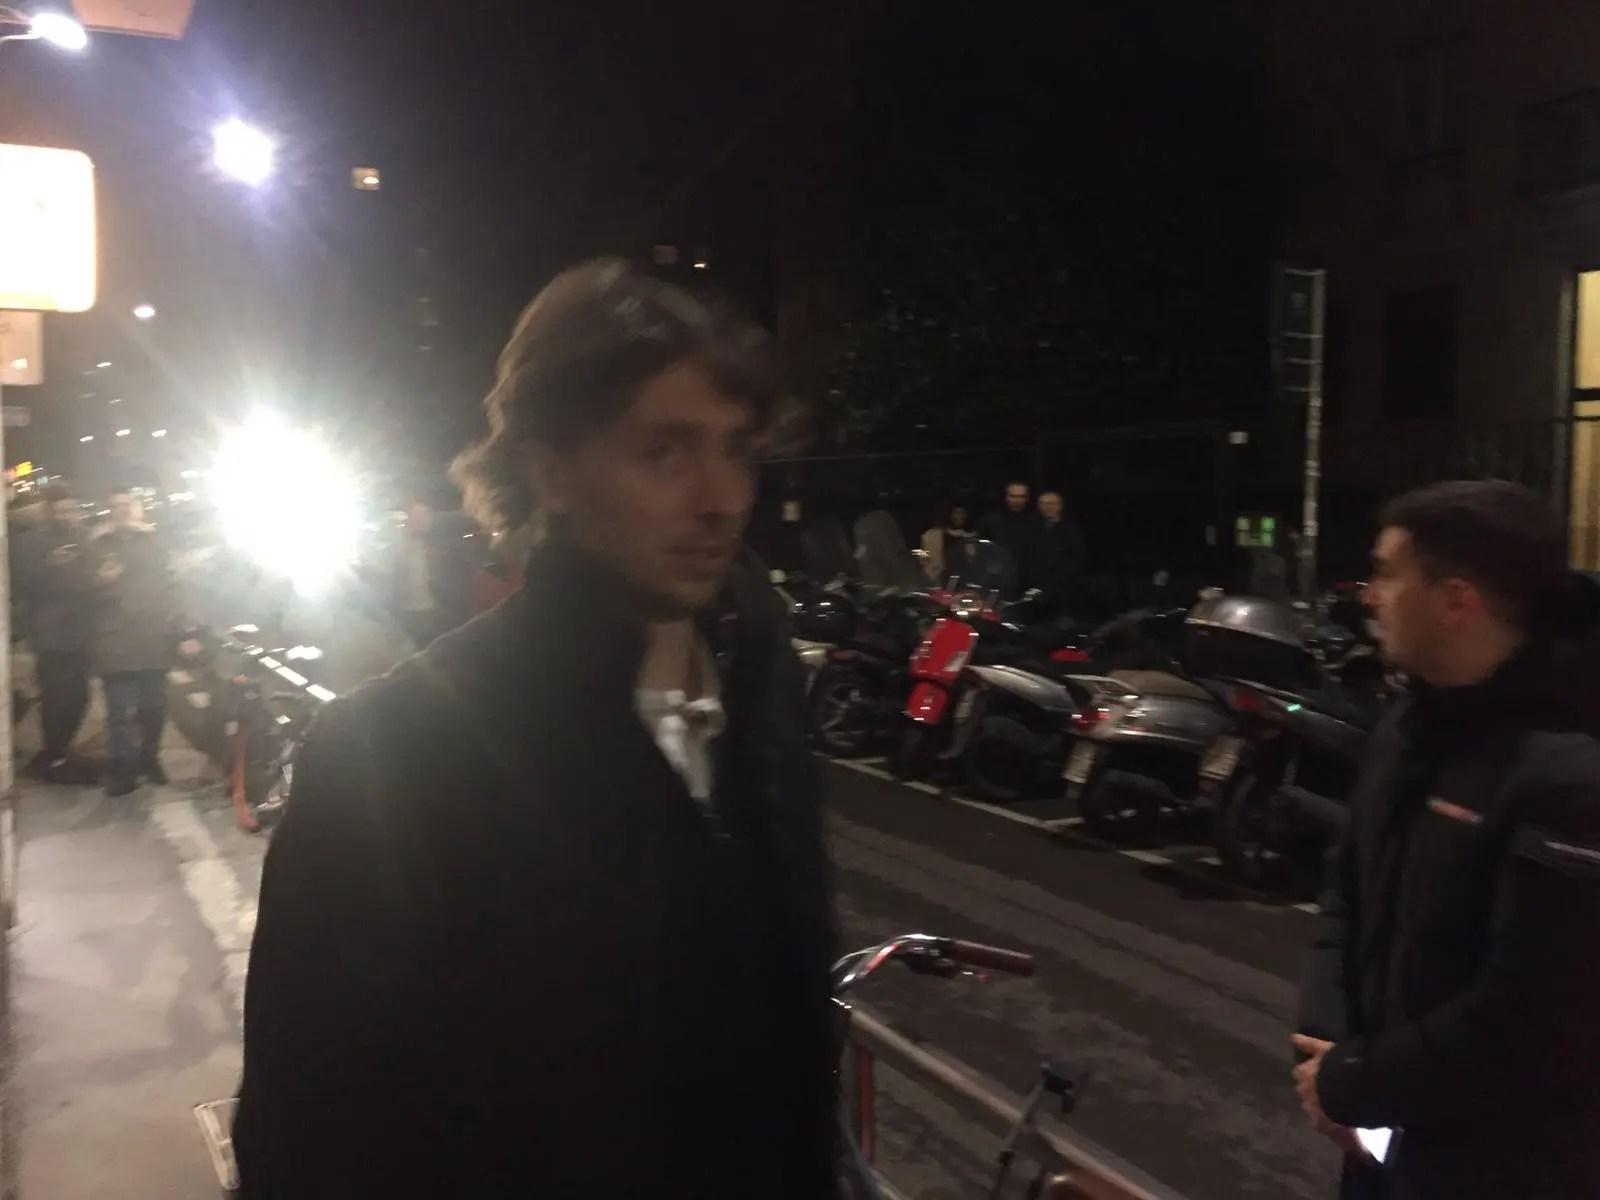 Milan, Maiorino: